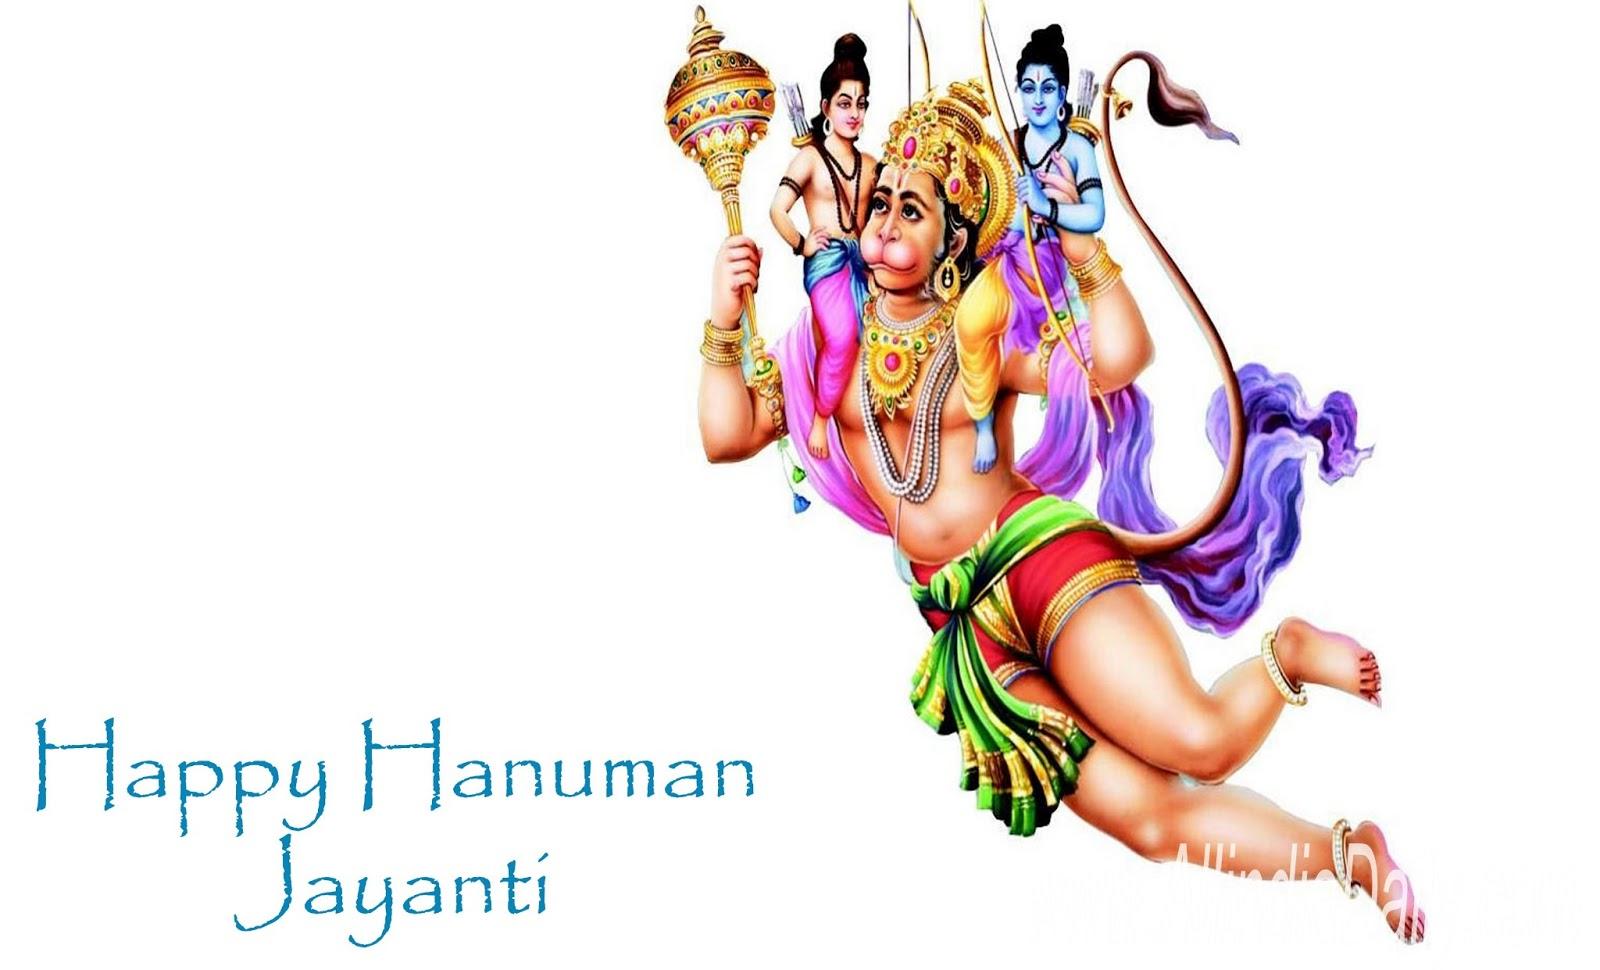 Hanuman Jayanti 2017 Wallpaper